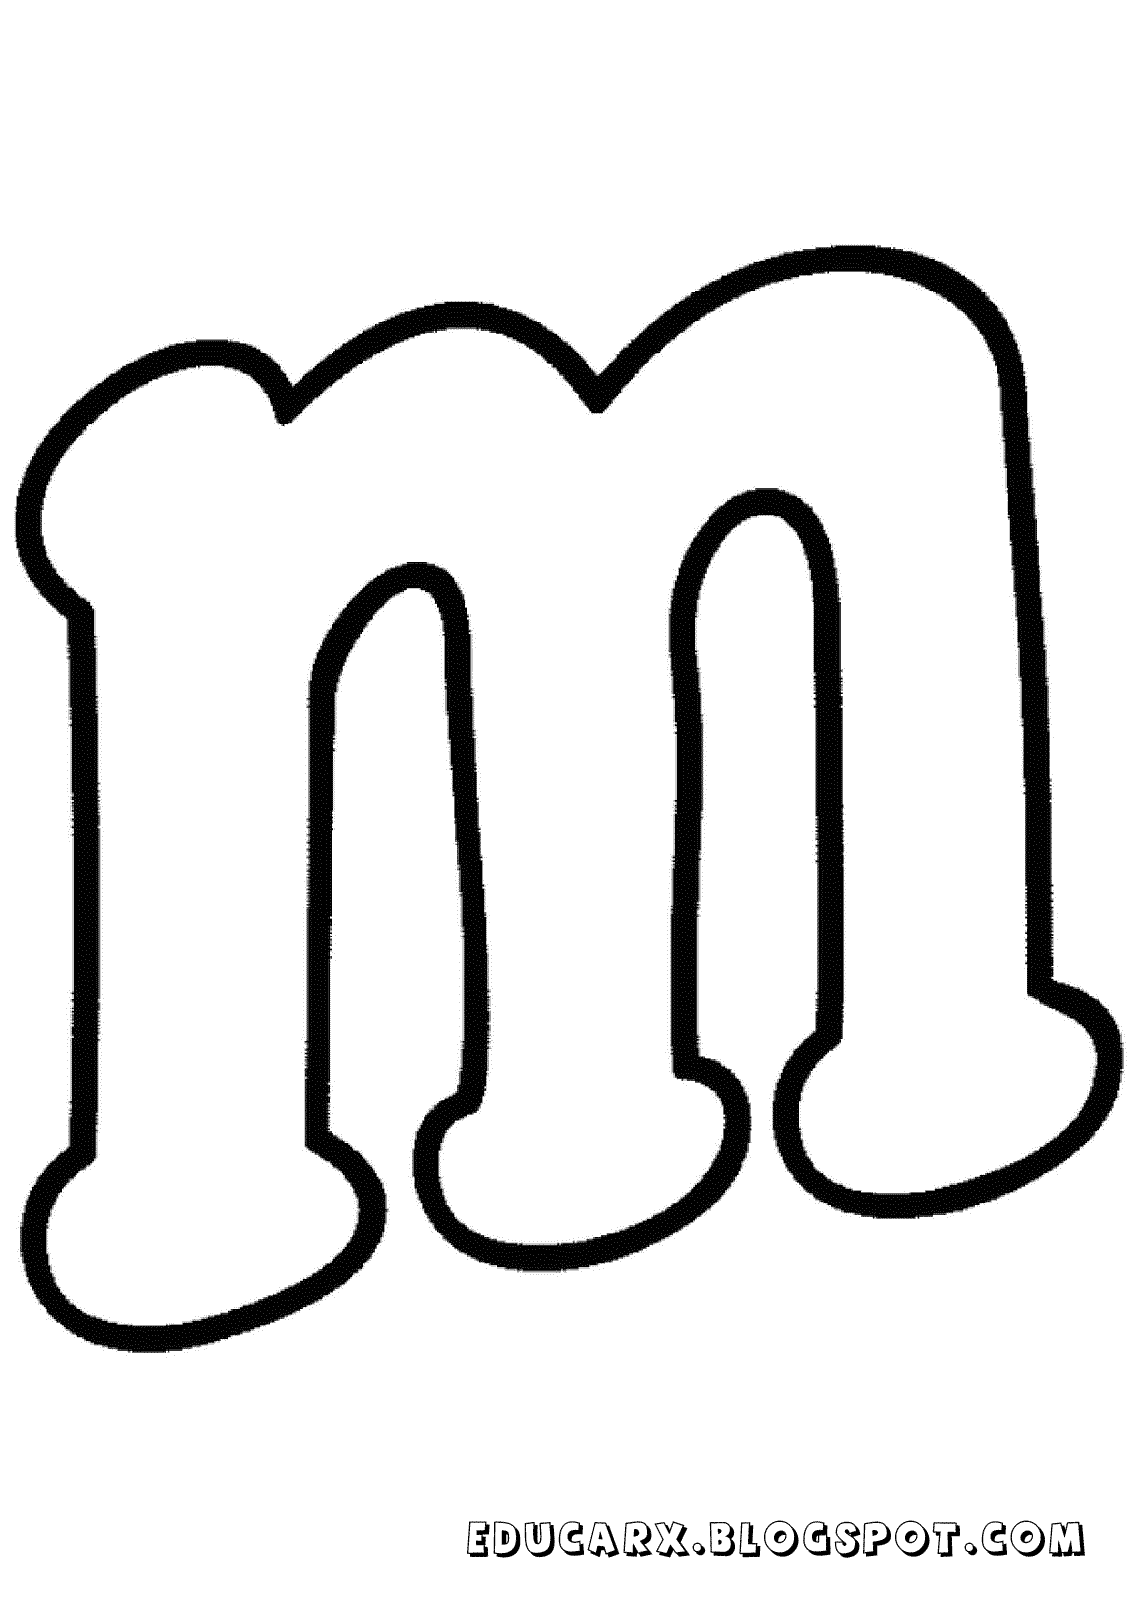 Molde da letra minuscula m